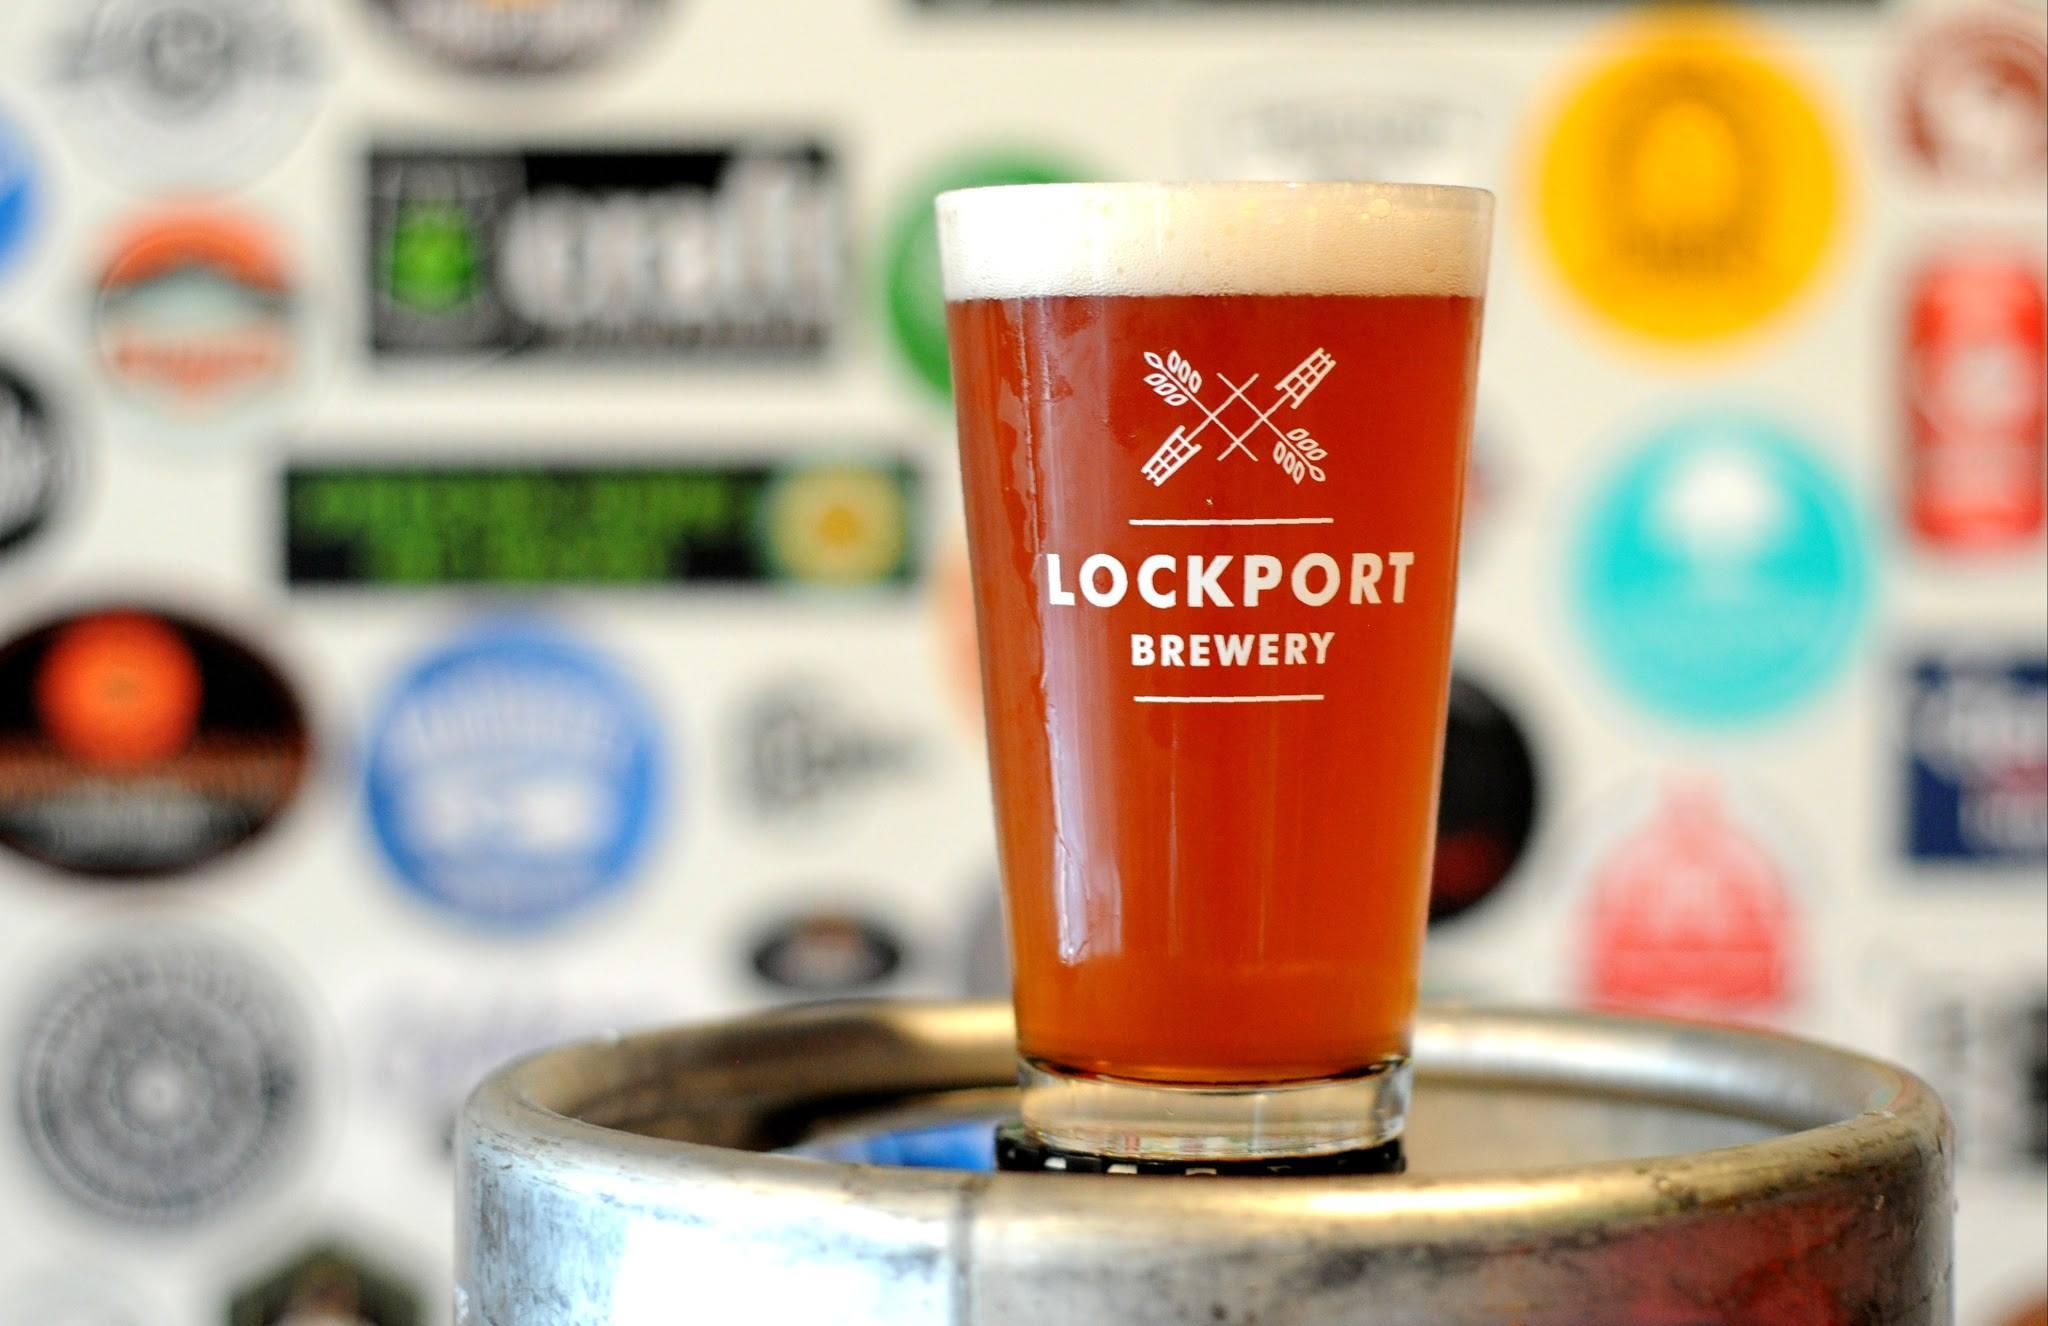 Lockport Brewery